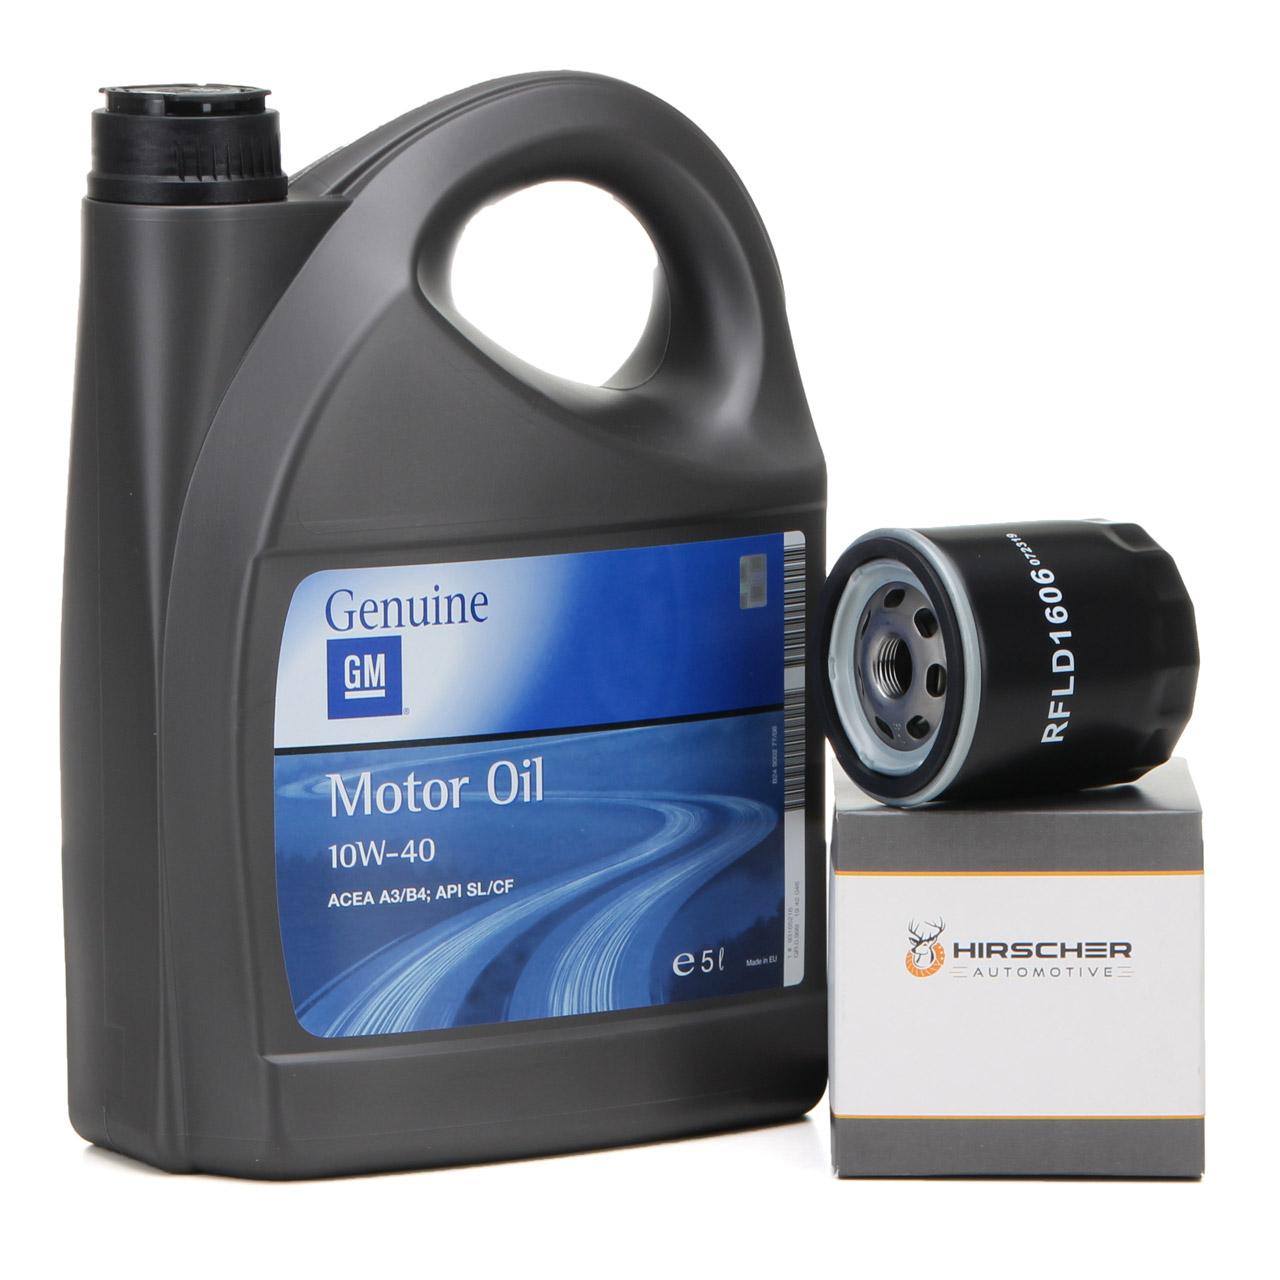 ORIGINAL GM Opel Öl 10W40 A3/B4 SL/CF 5L 93165216 + HIRSCHER Ölfilter 95509857